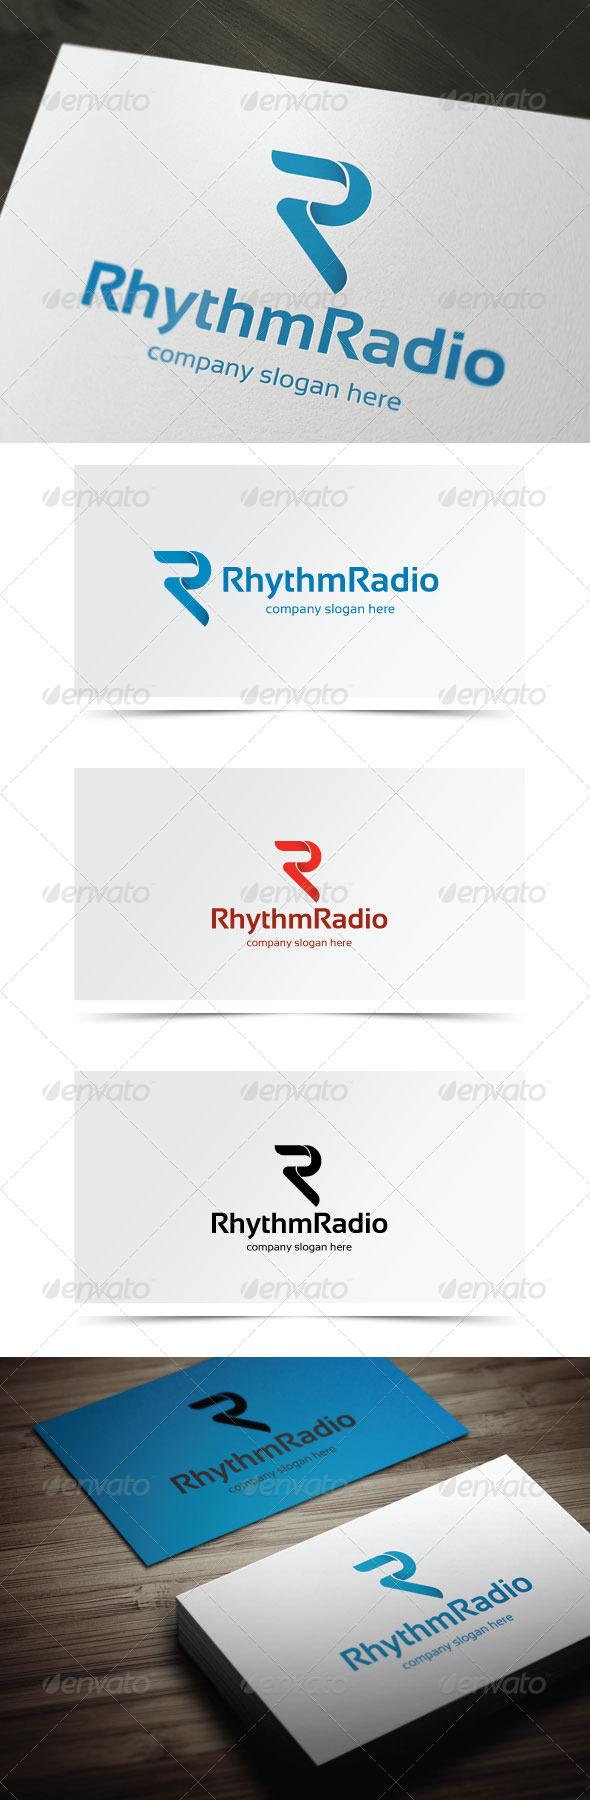 GraphicRiver Rhythm Radio 6332859